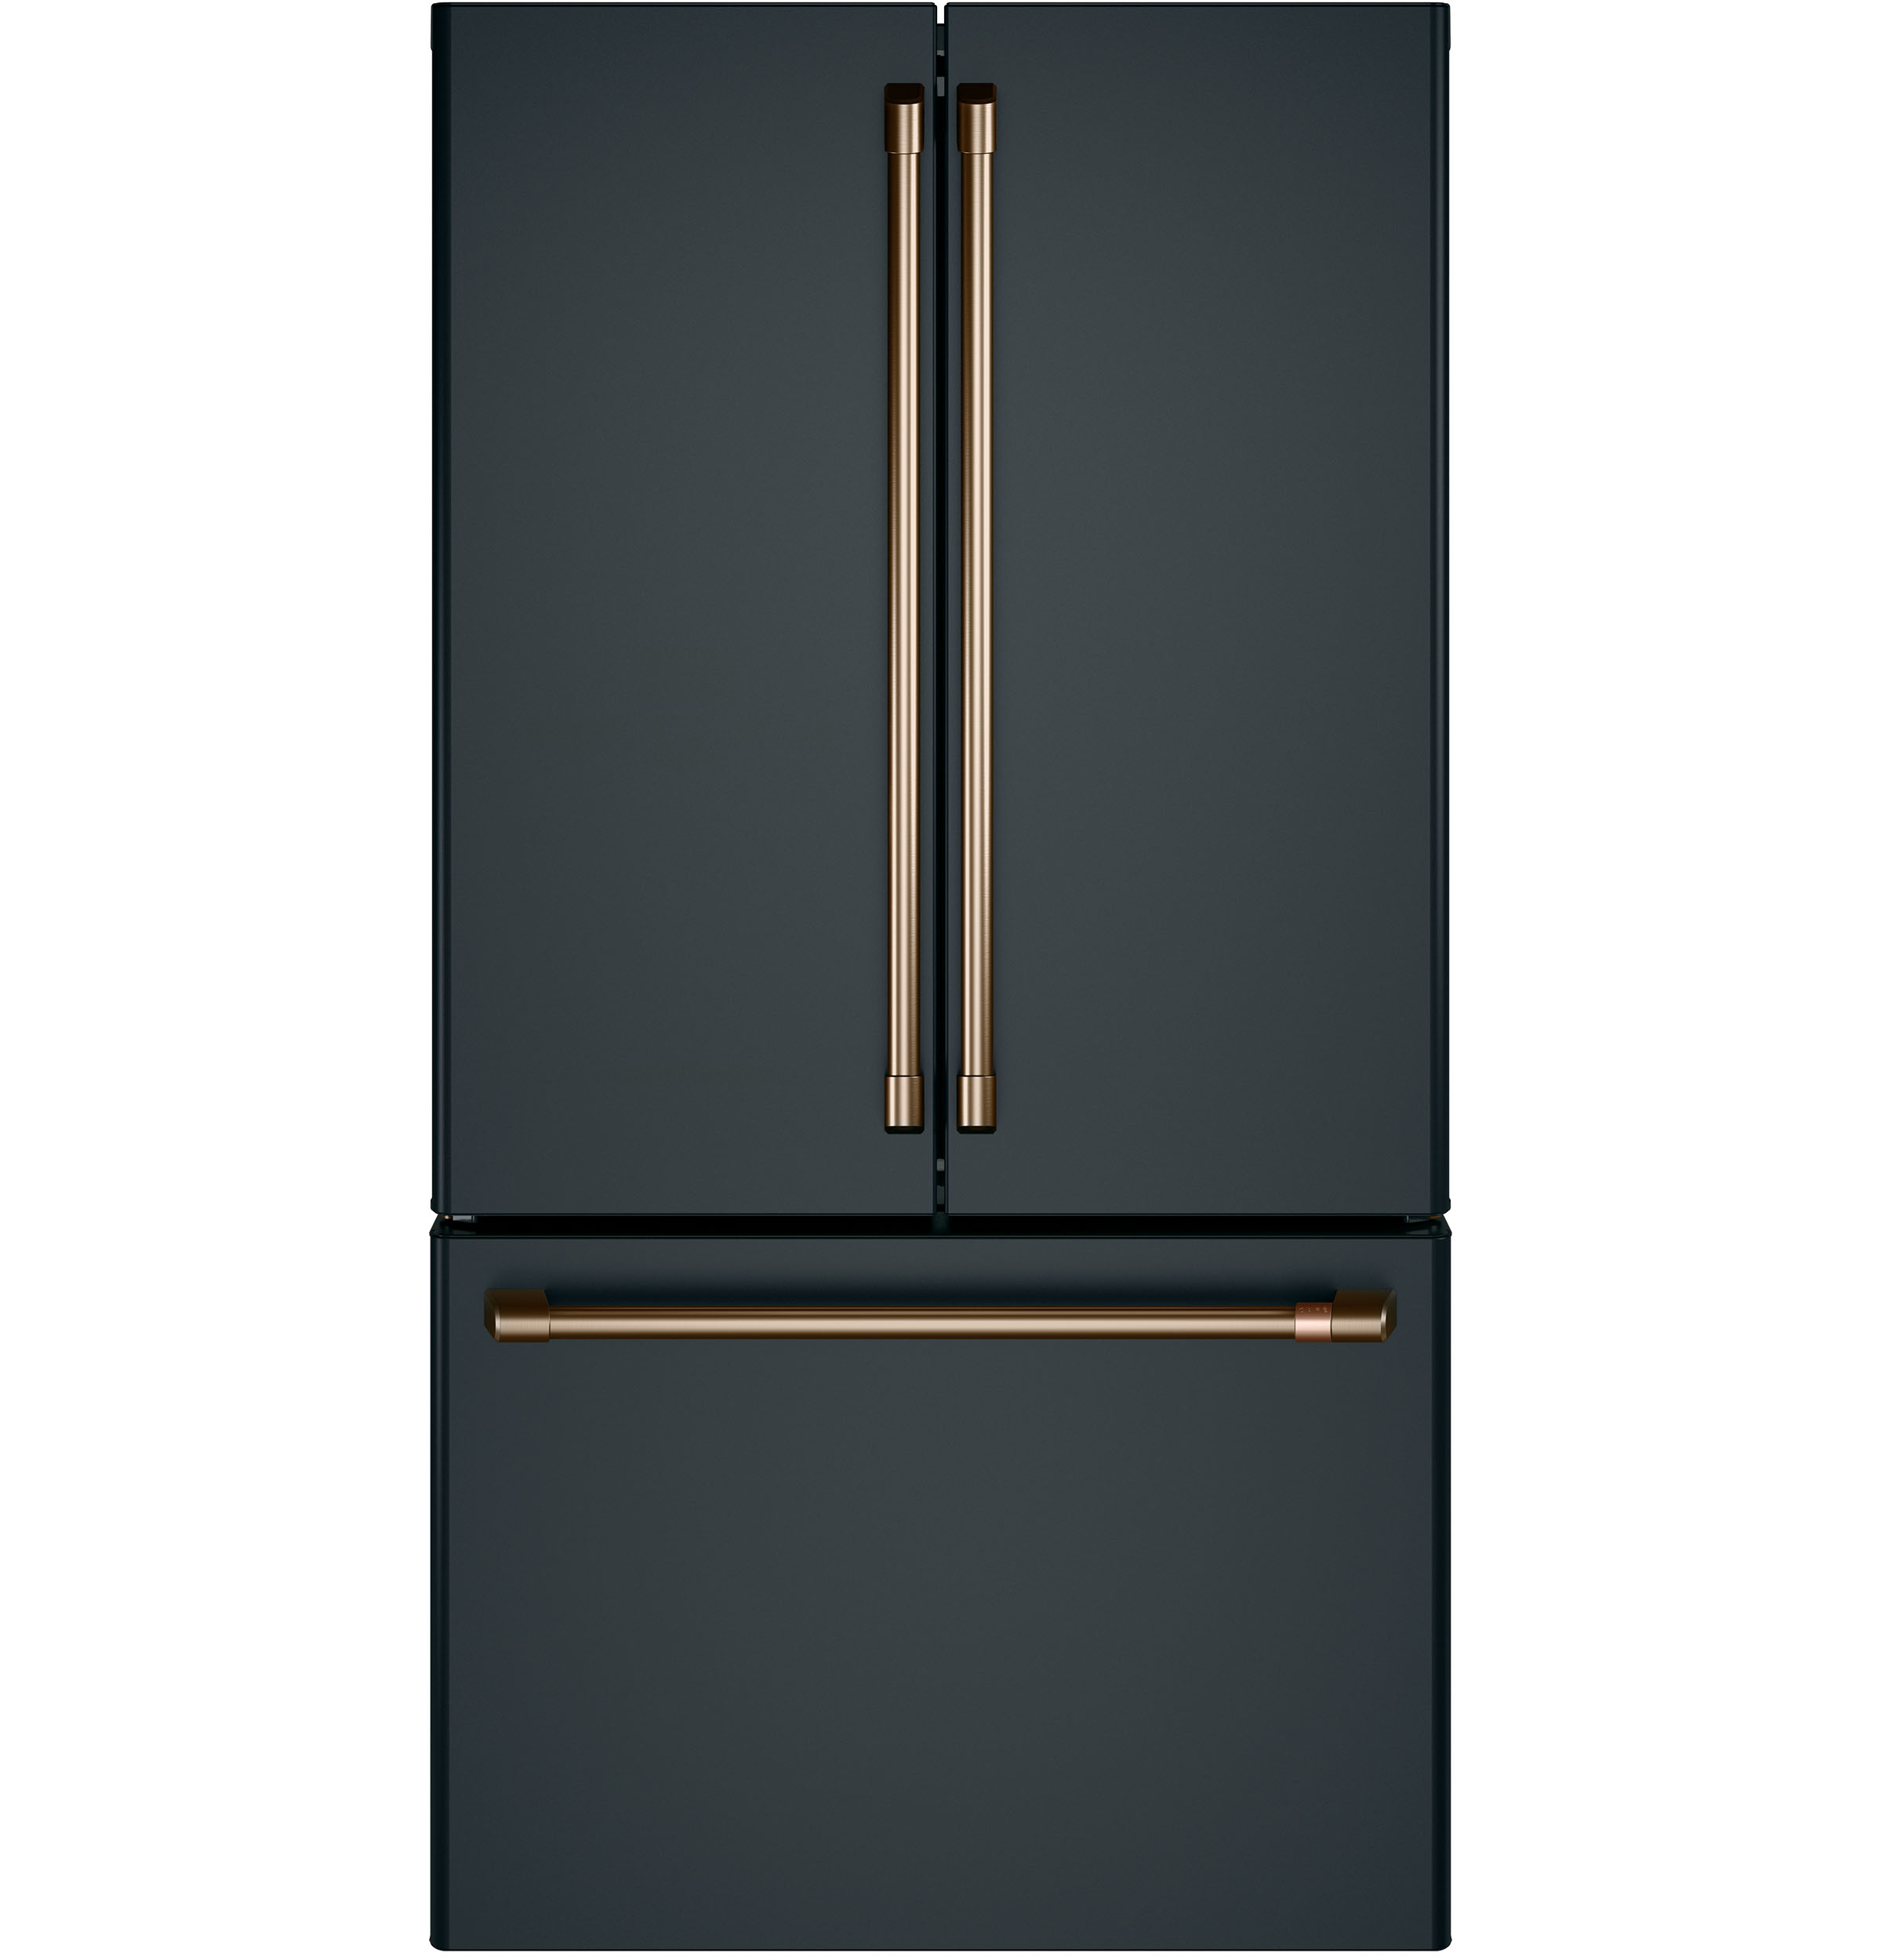 Model: CWE23SP3MD1 | Café™ ENERGY STAR® 23.1 Cu. Ft. Counter-Depth French-Door Refrigerator